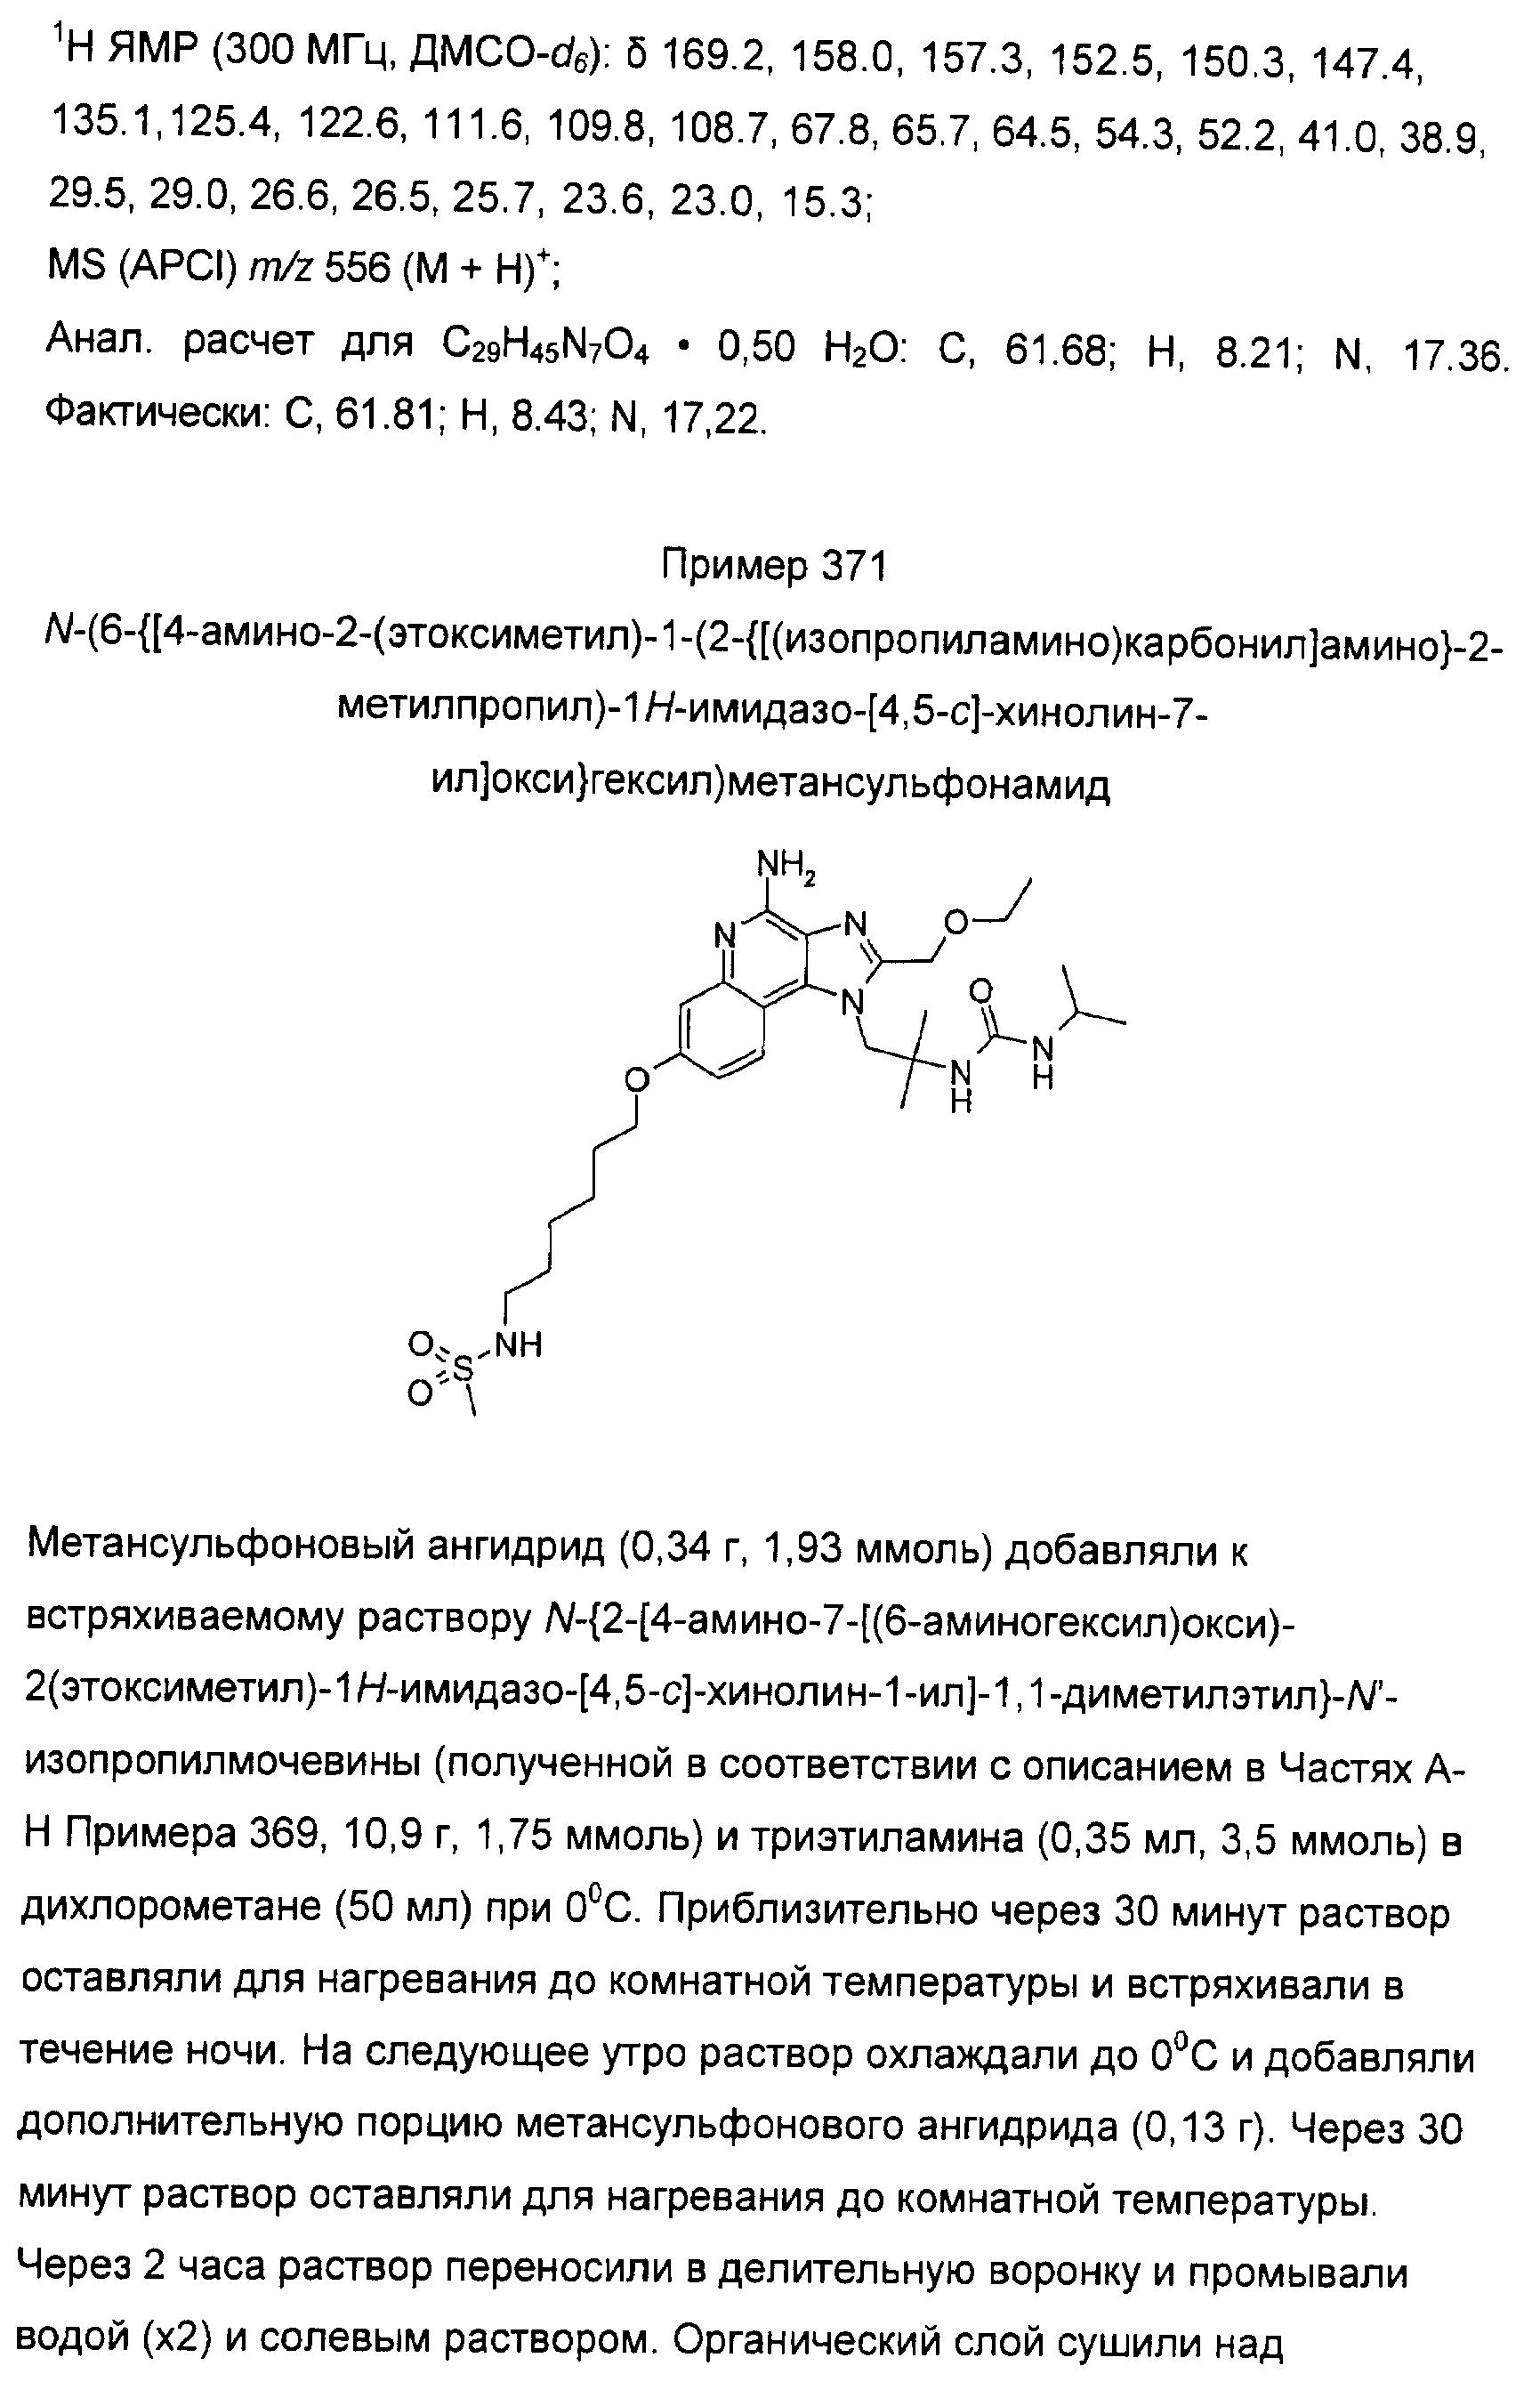 Figure 00000236